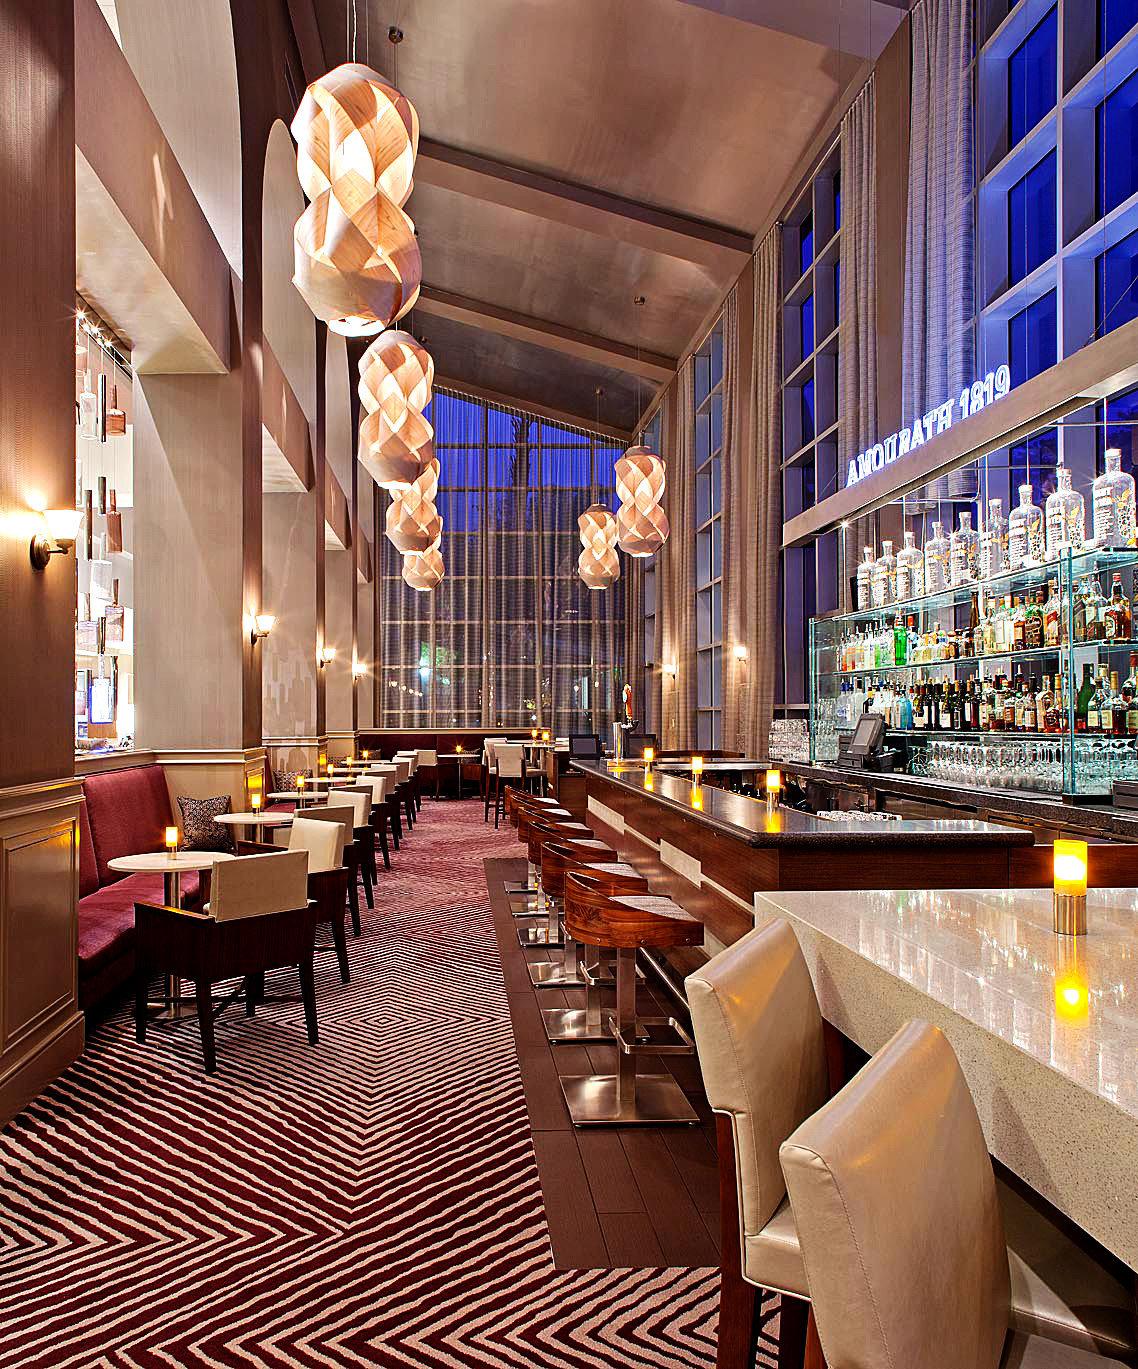 Bar Dining Drink Eat Hip Modern building Lobby restaurant function hall convention center